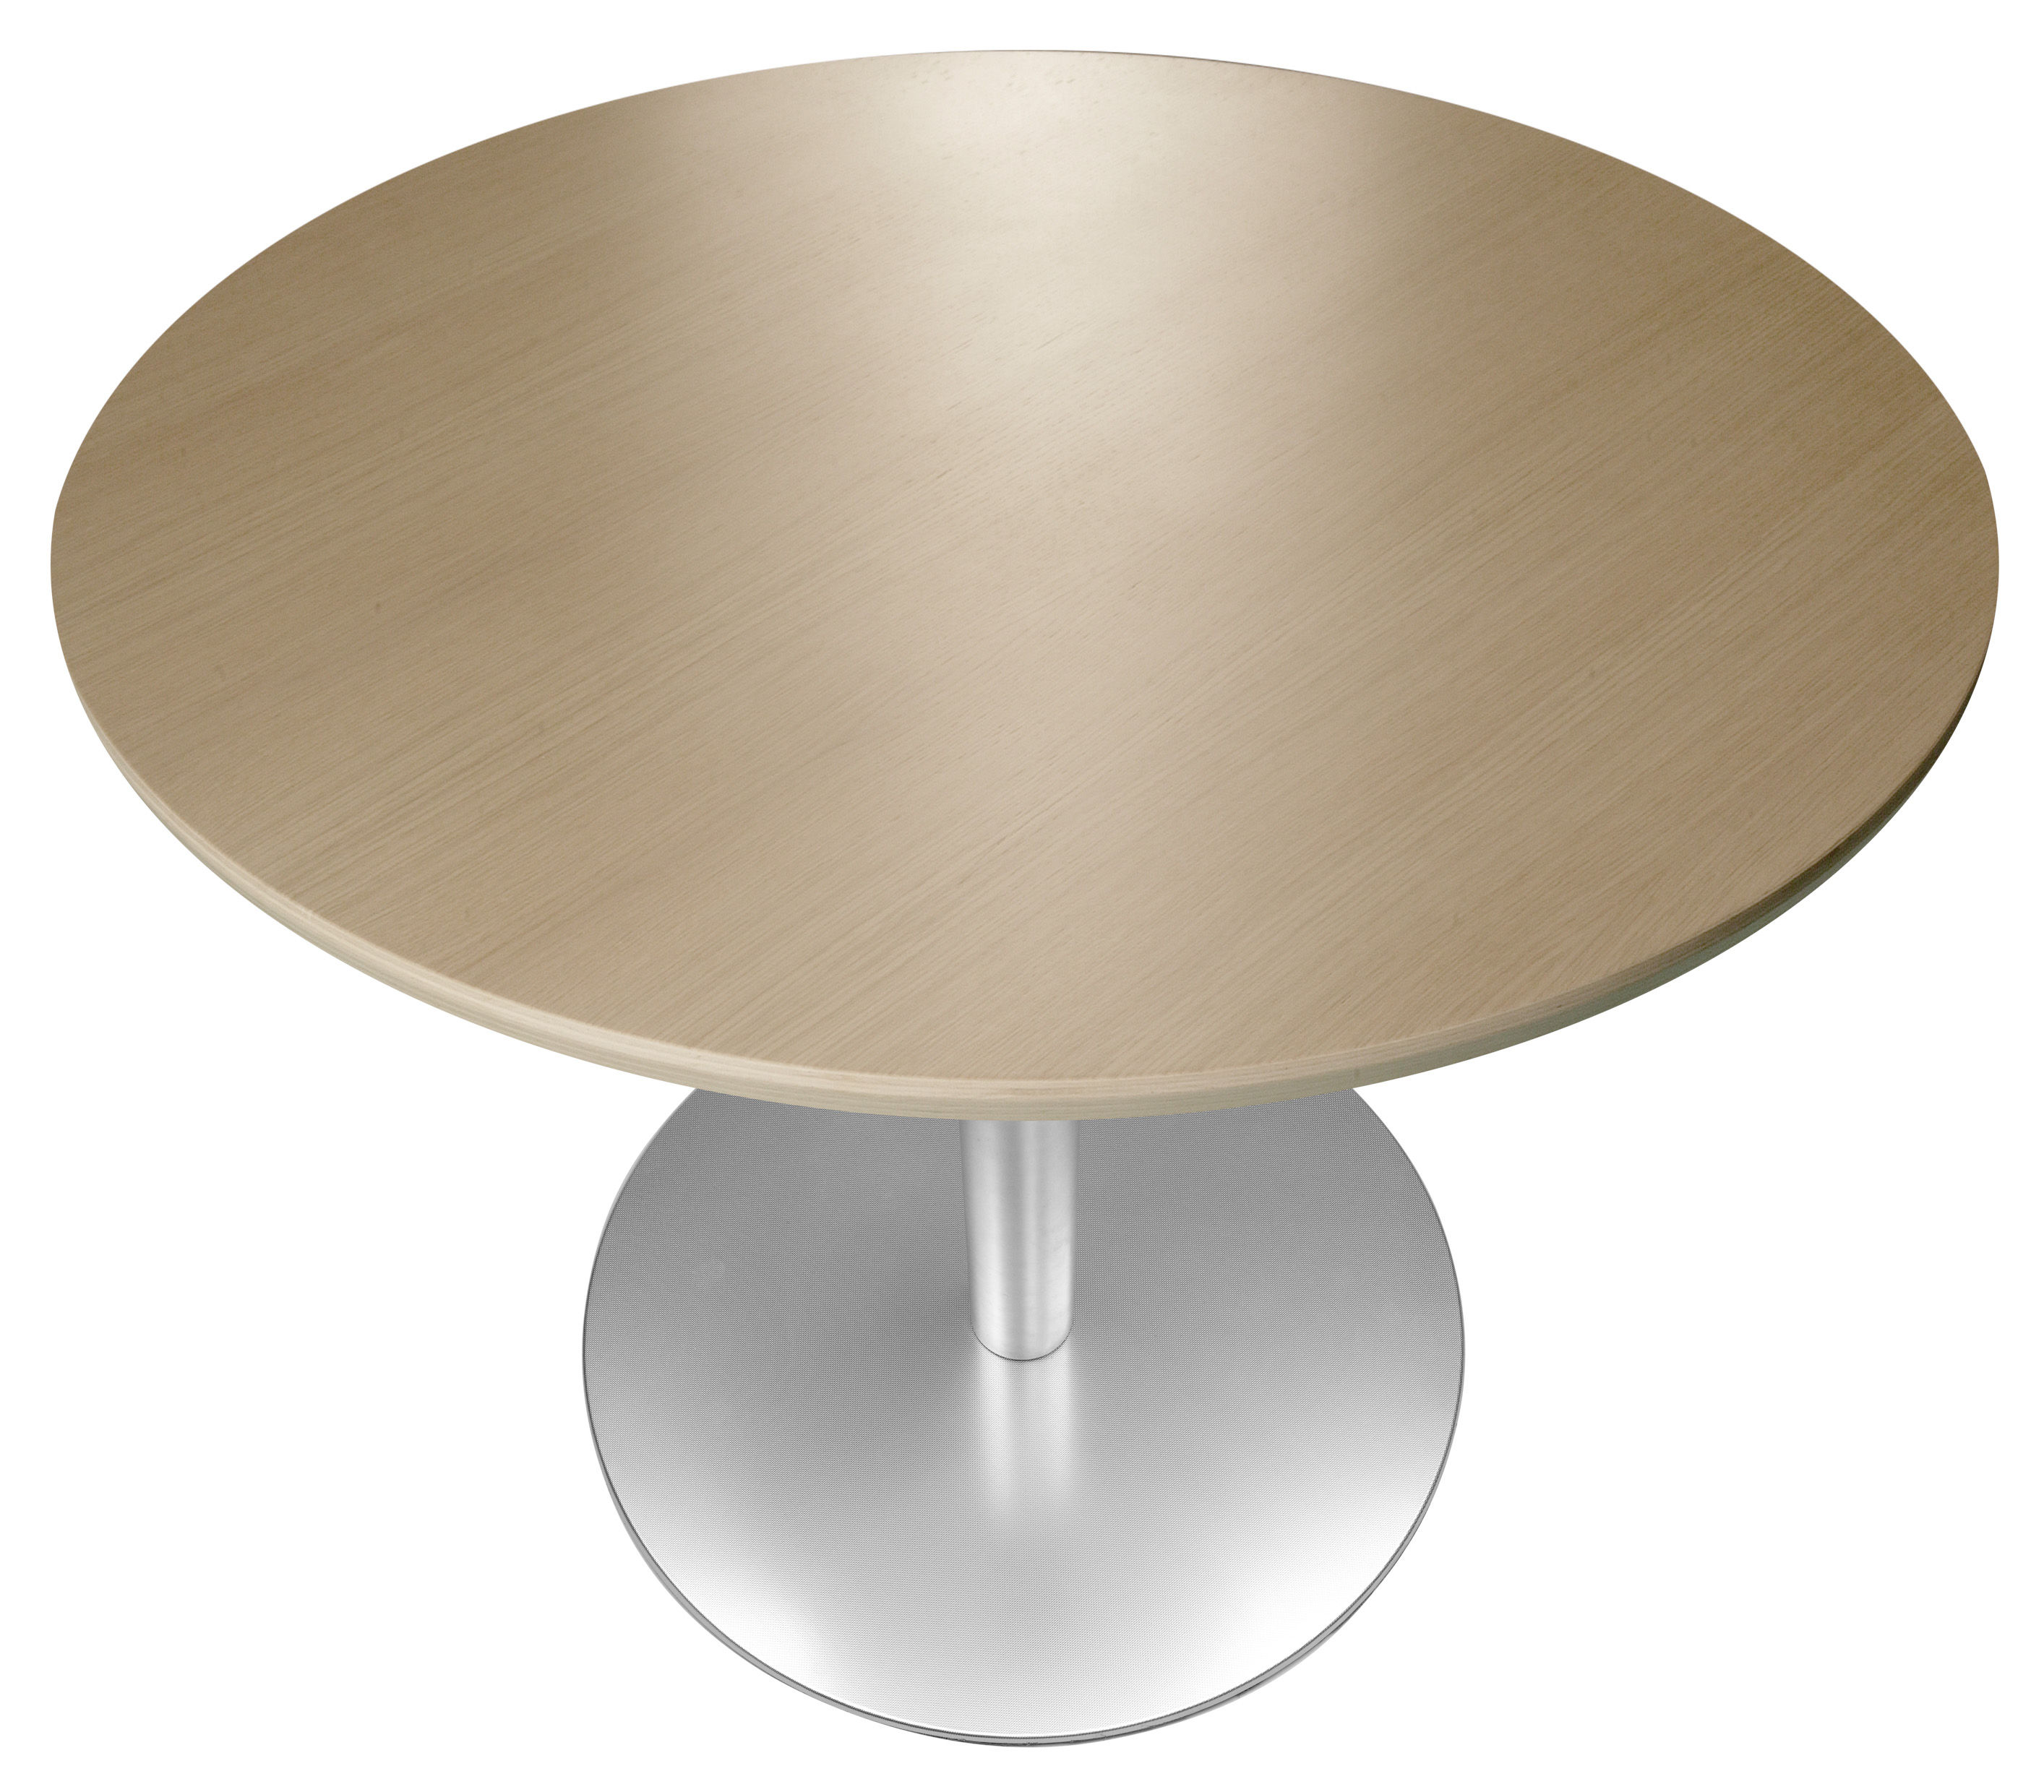 table hauteur r glable rondo lapalma blanc bois. Black Bedroom Furniture Sets. Home Design Ideas